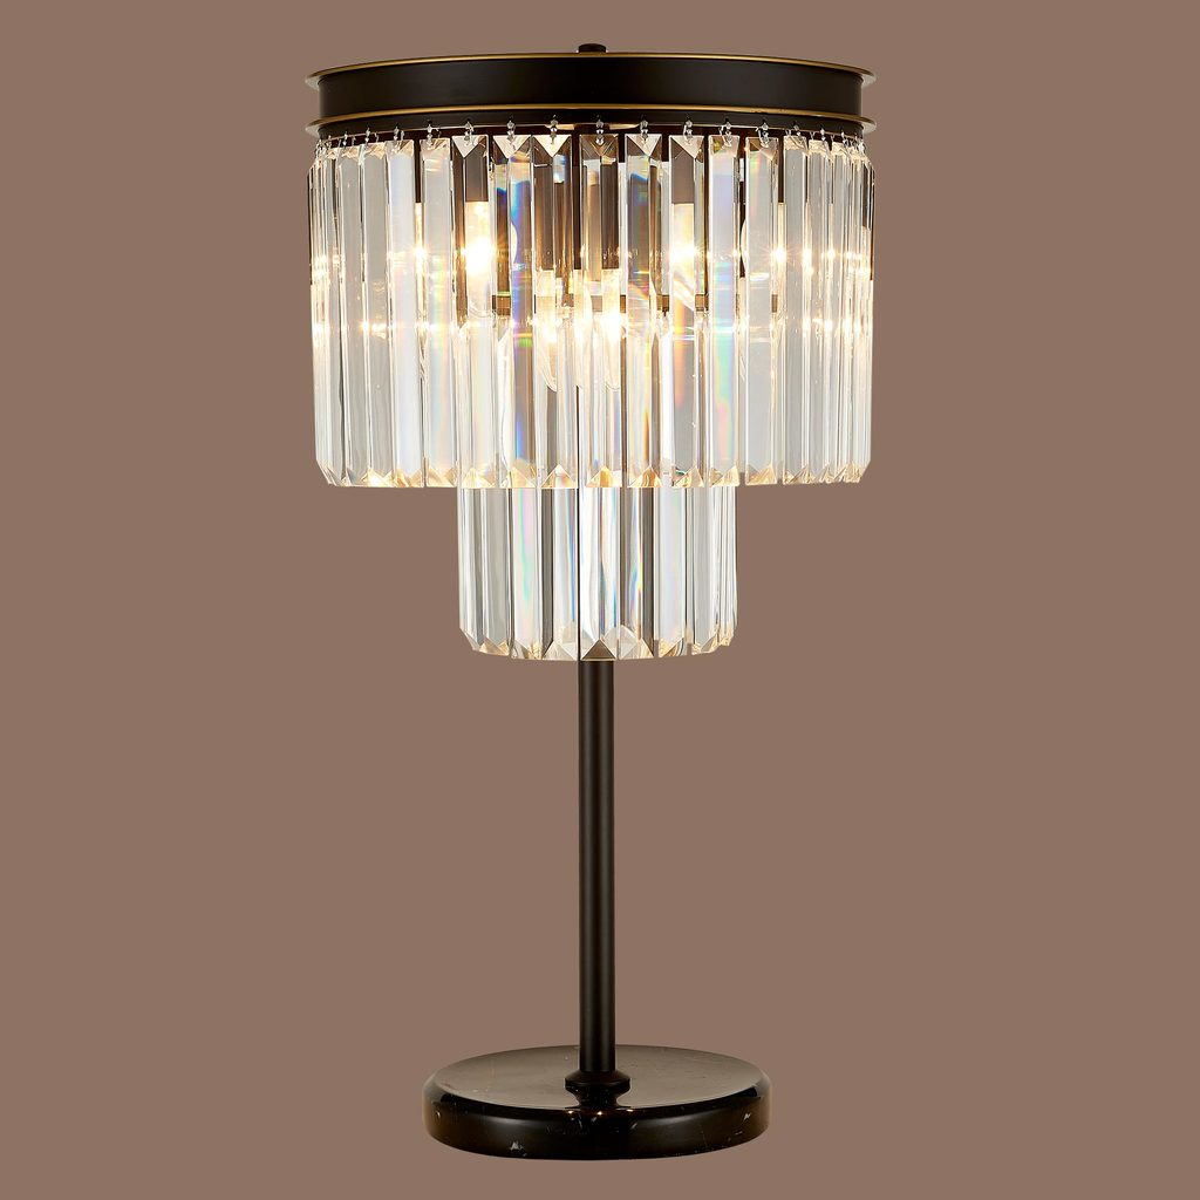 Настольная лампа Citilux Мартин CL332861, 6xE14x60W, венге, прозрачный, металл, хрусталь - фото 3